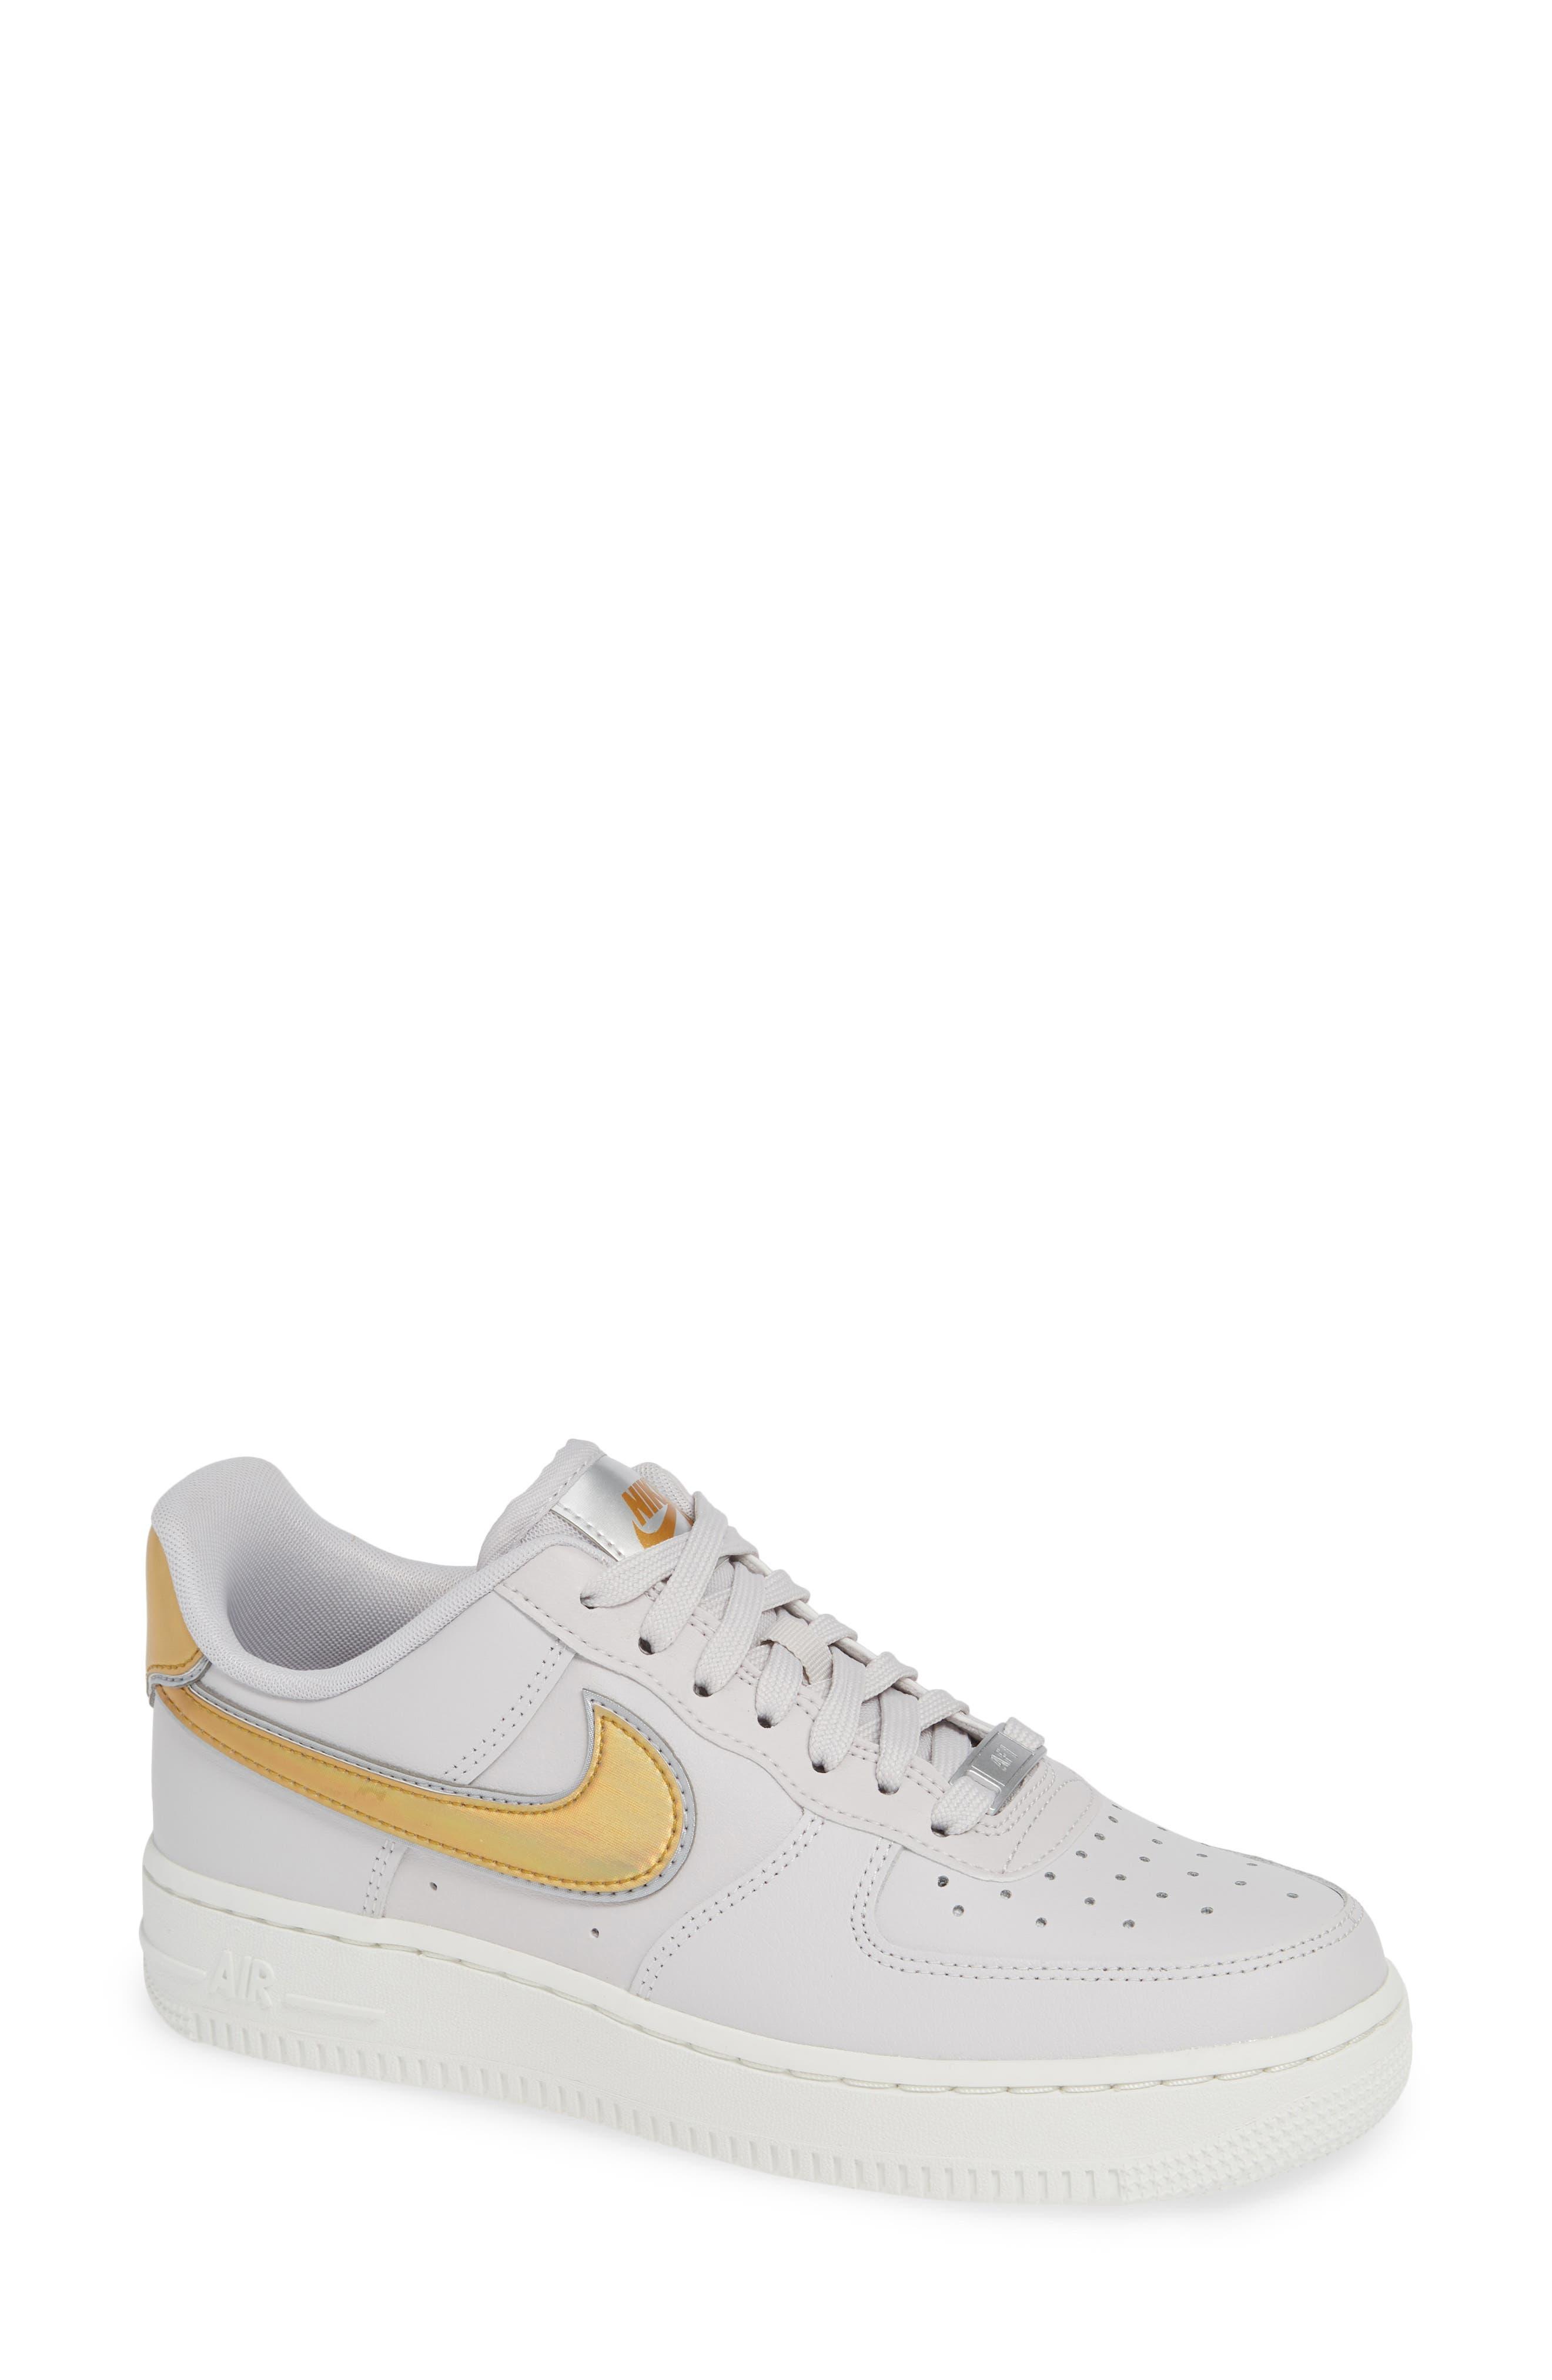 Air Force 1 '07 Premium Sneaker,                             Main thumbnail 1, color,                             GREY/ METALLIC GOLD- WHITE